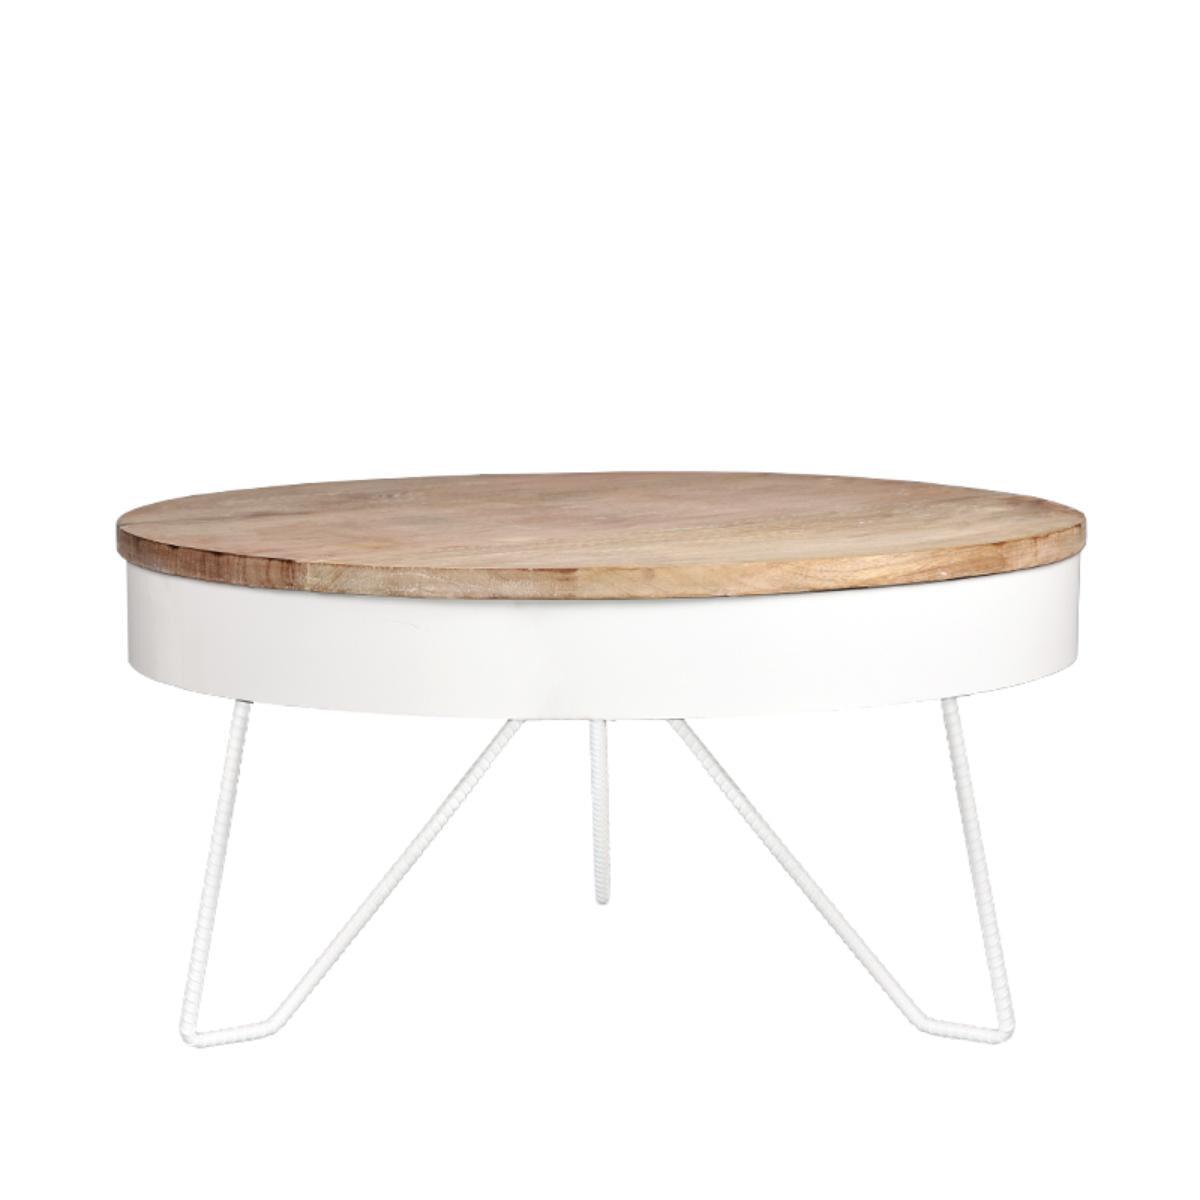 LABEL51 salontafel 'Saran' 80x80x43 cm, kleur Wit